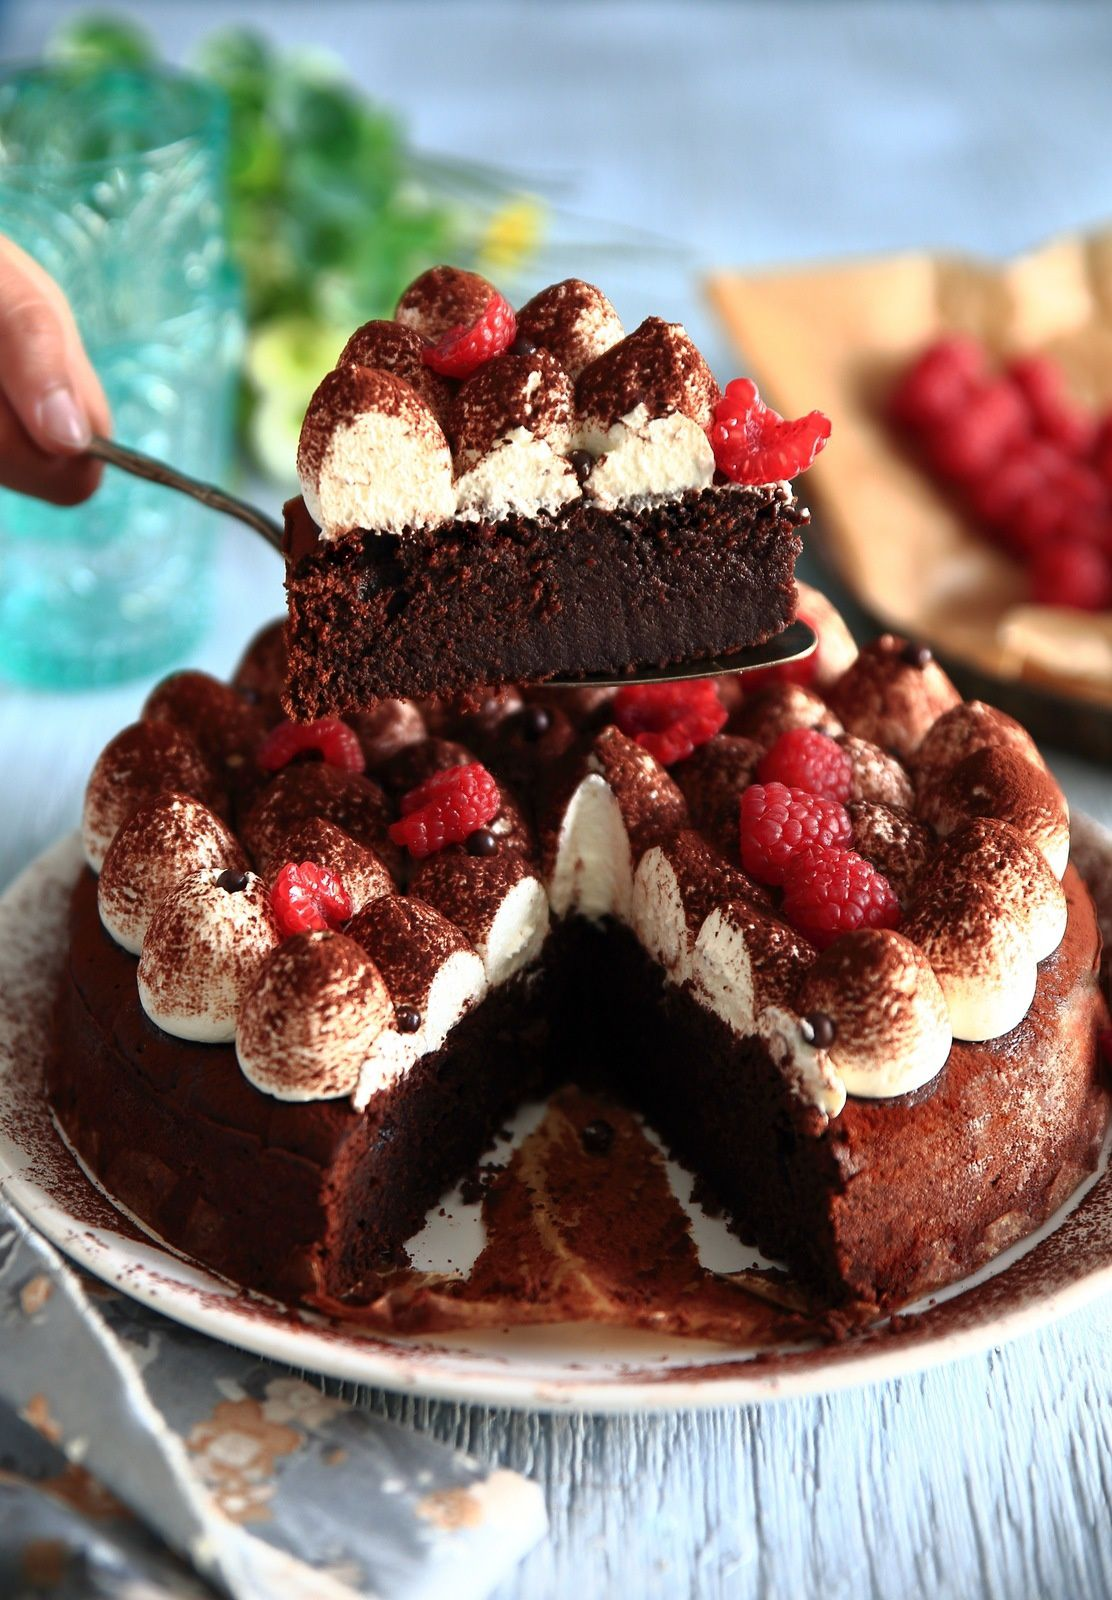 Le Tiramicake - Fudge cake et chantilly mascarpone